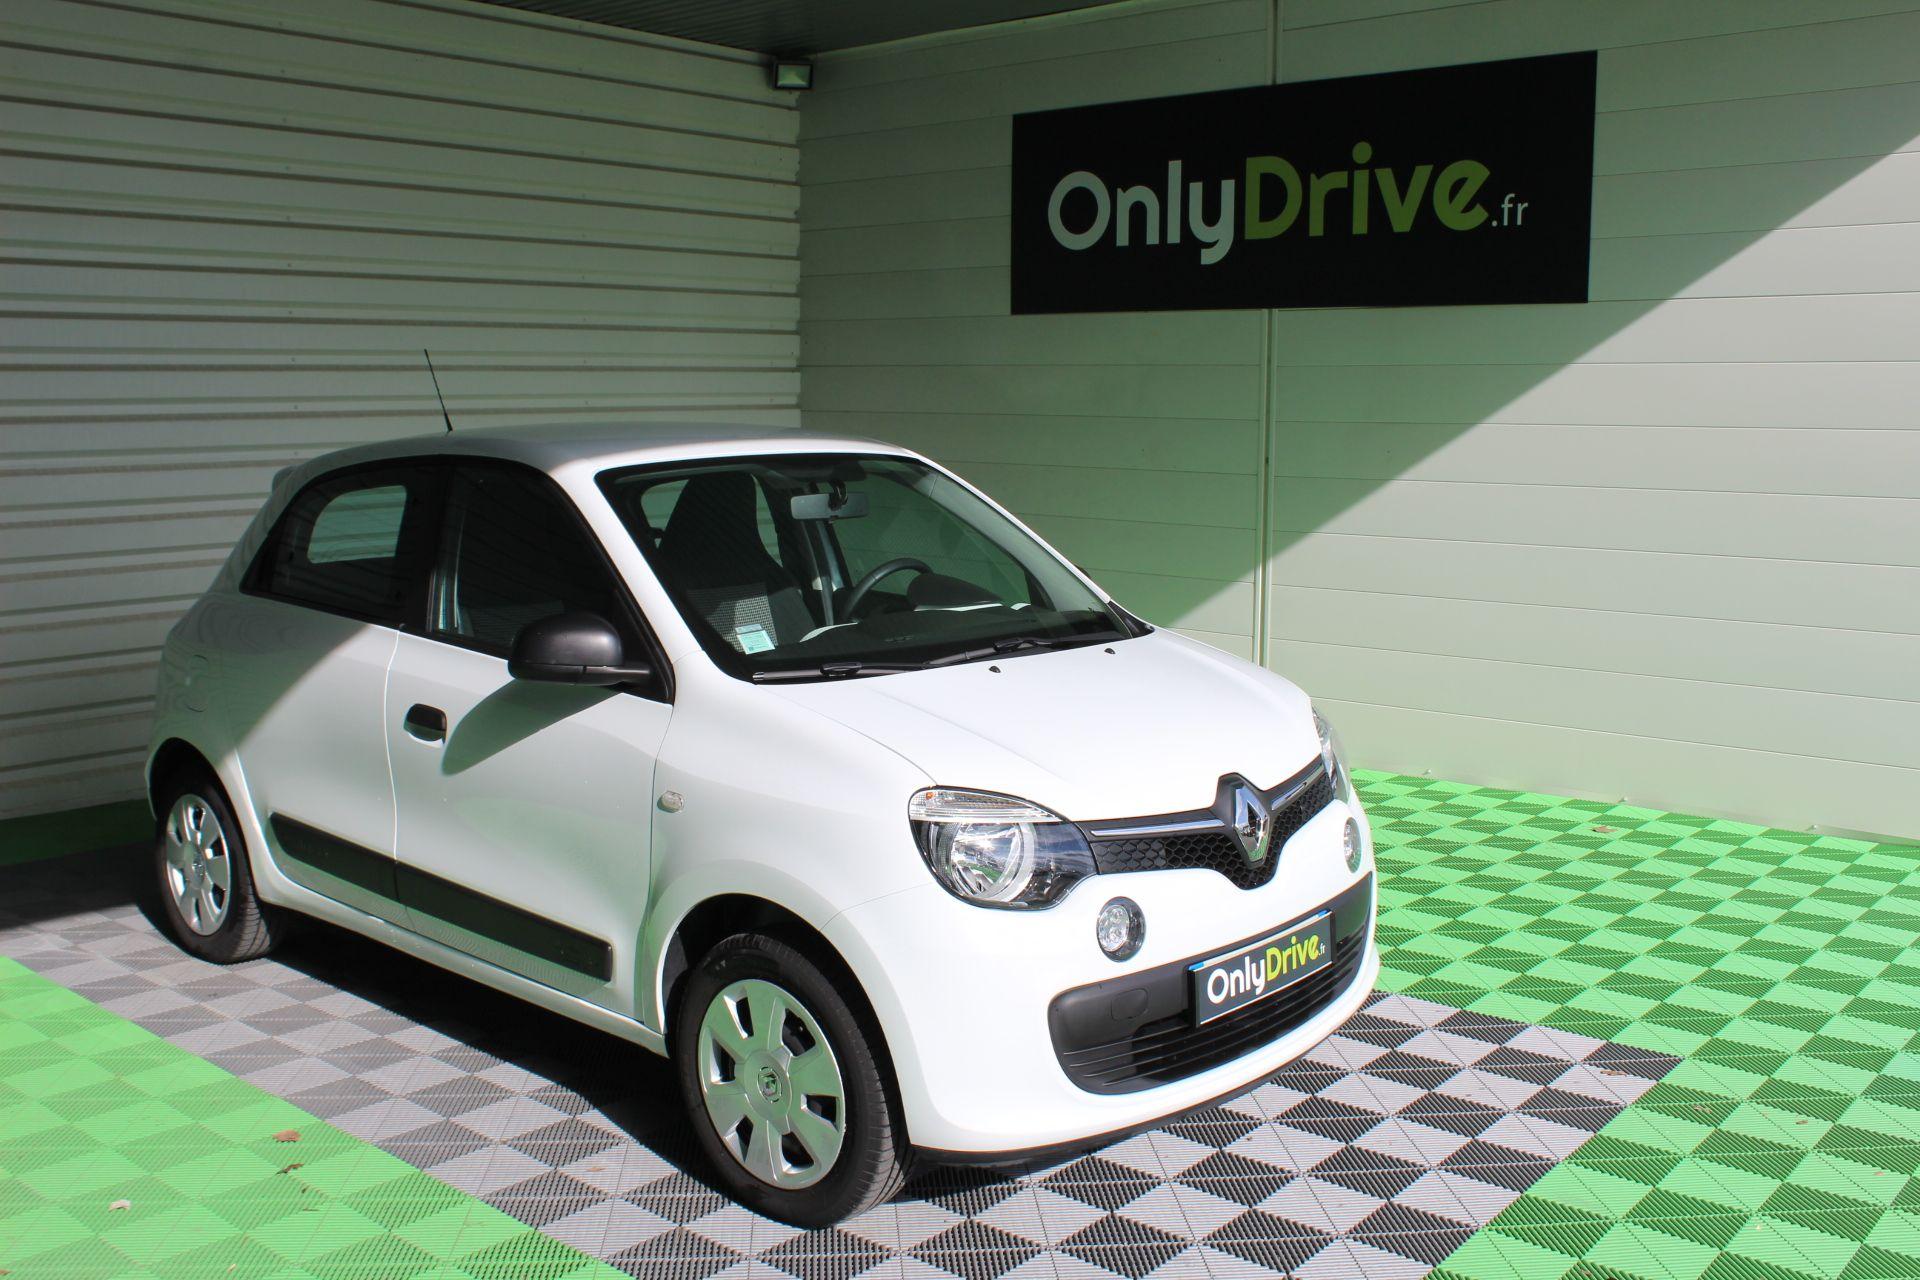 Renault Twingo Iii 1 0 Sce 70 Life E6 2015 Location De Voiture